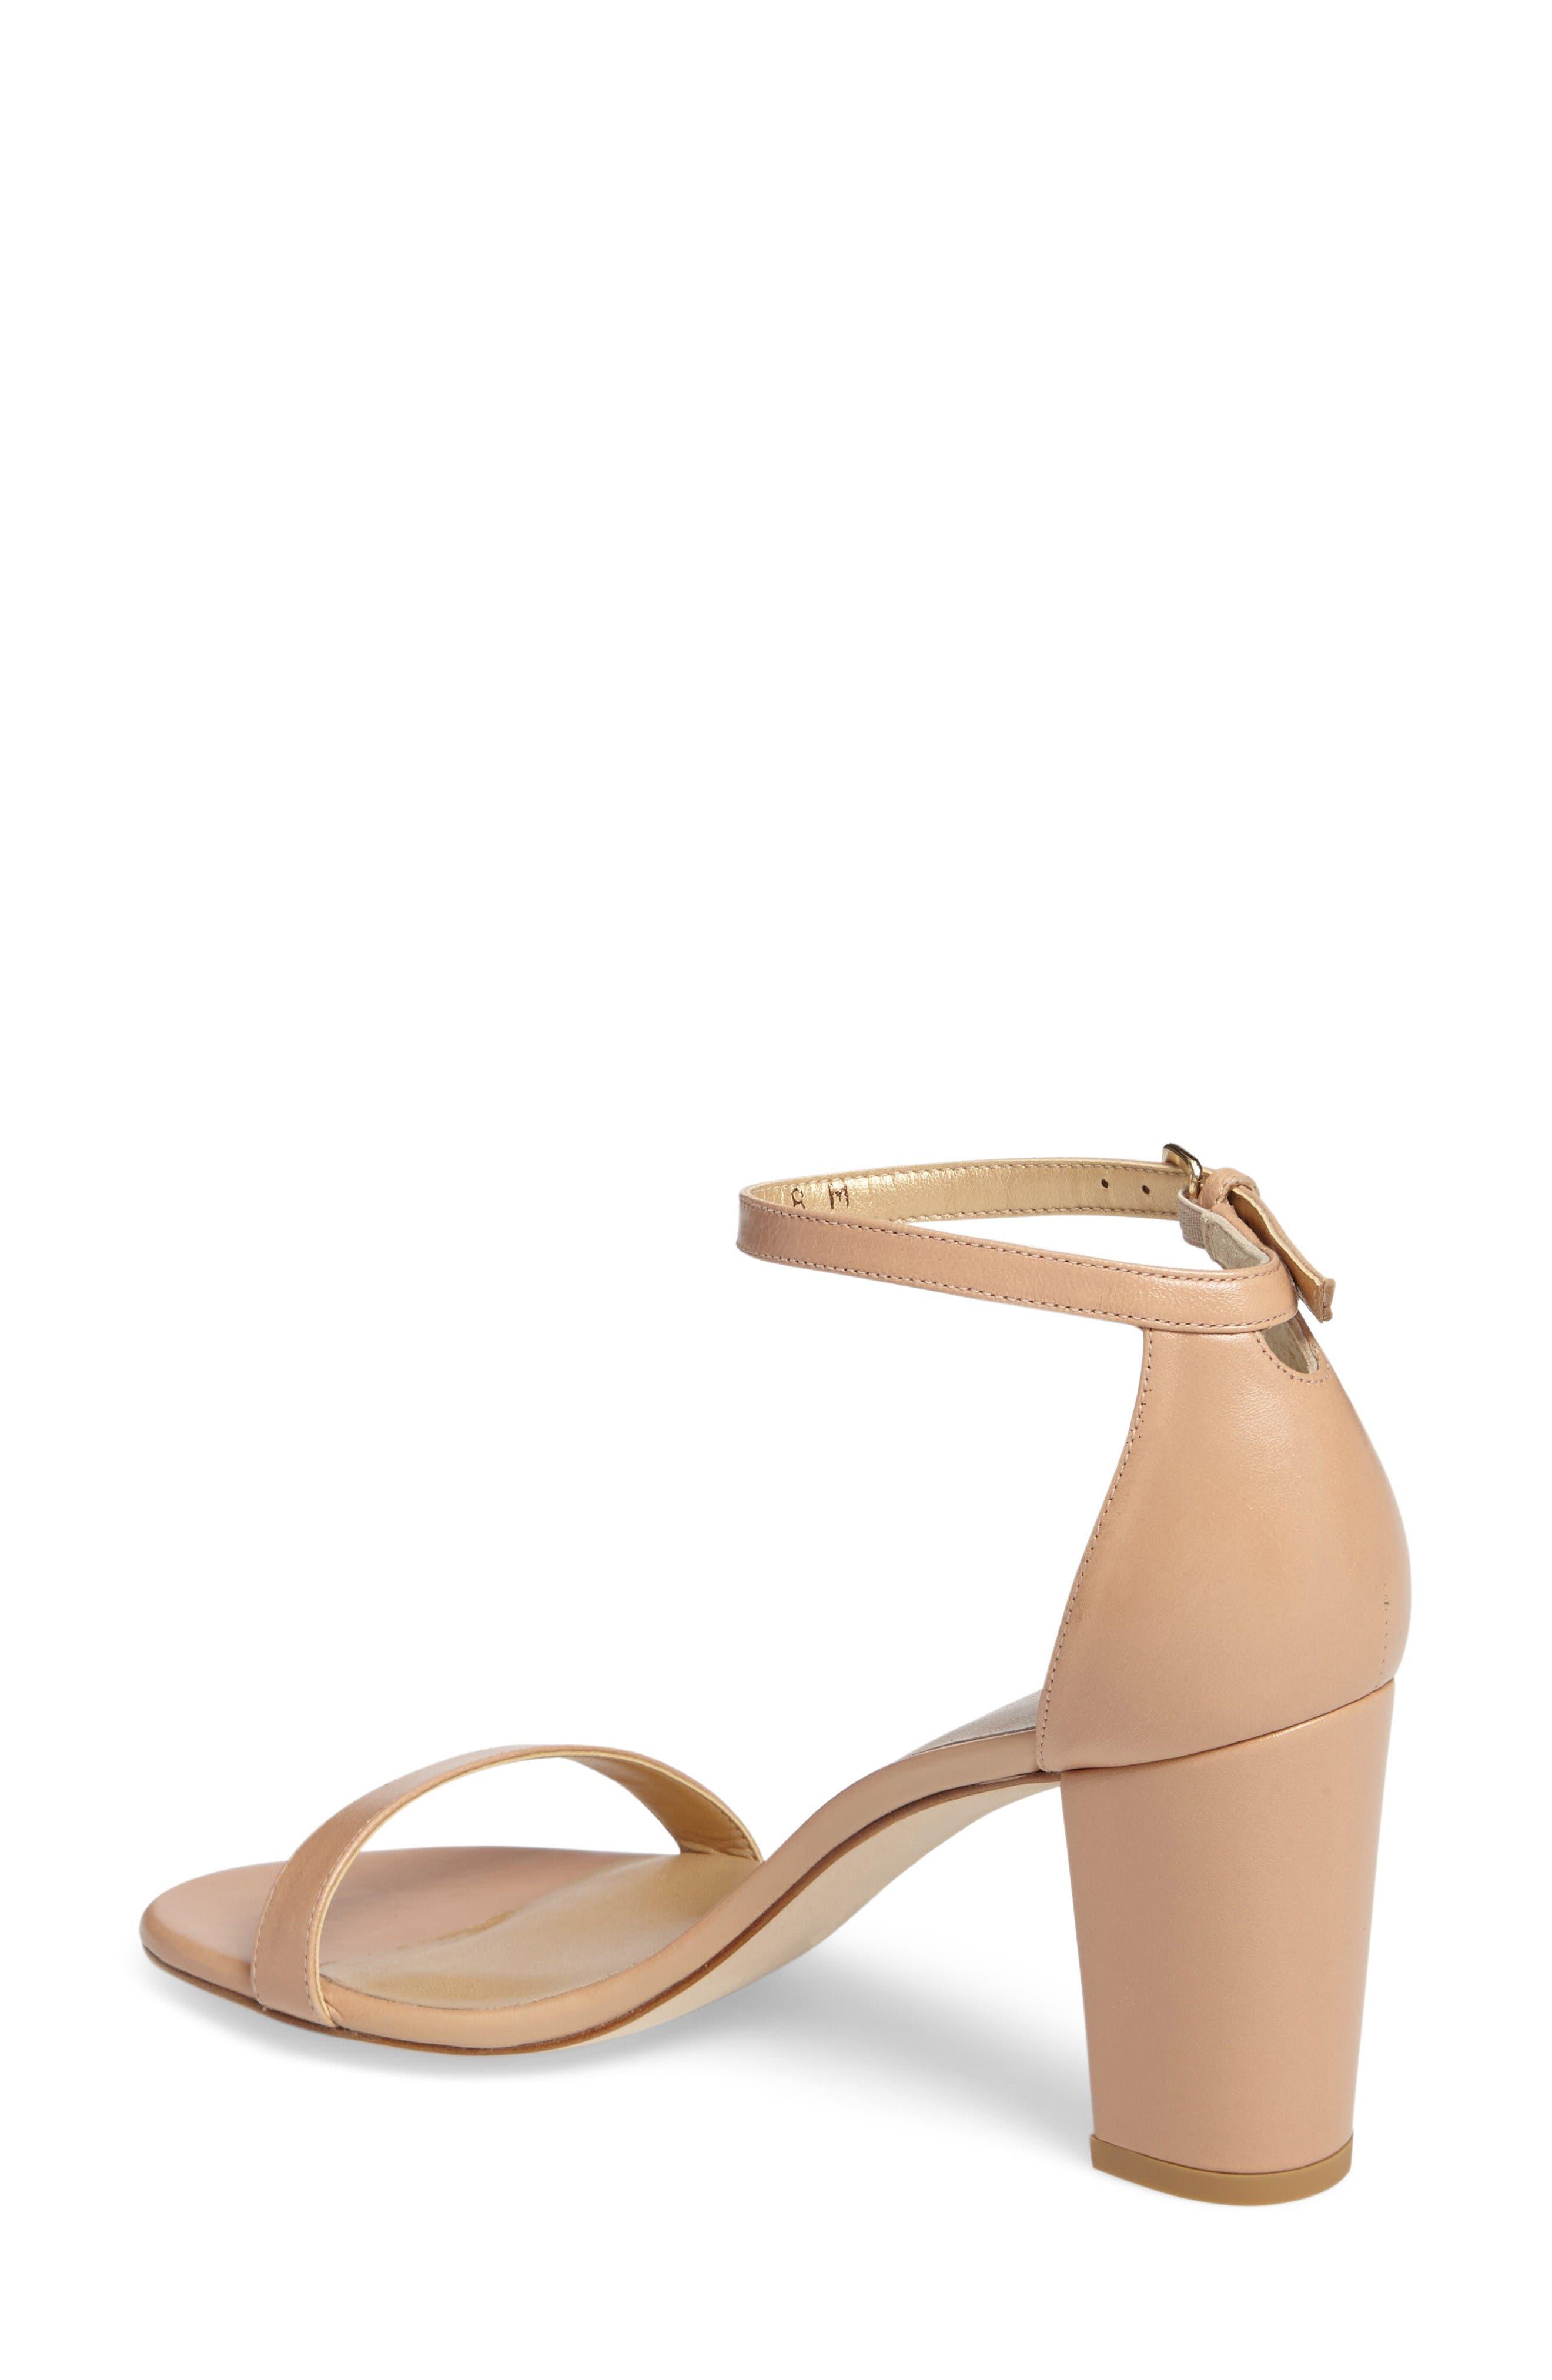 NearlyNude Ankle Strap Sandal,                             Alternate thumbnail 2, color,                             Bambina Nappa